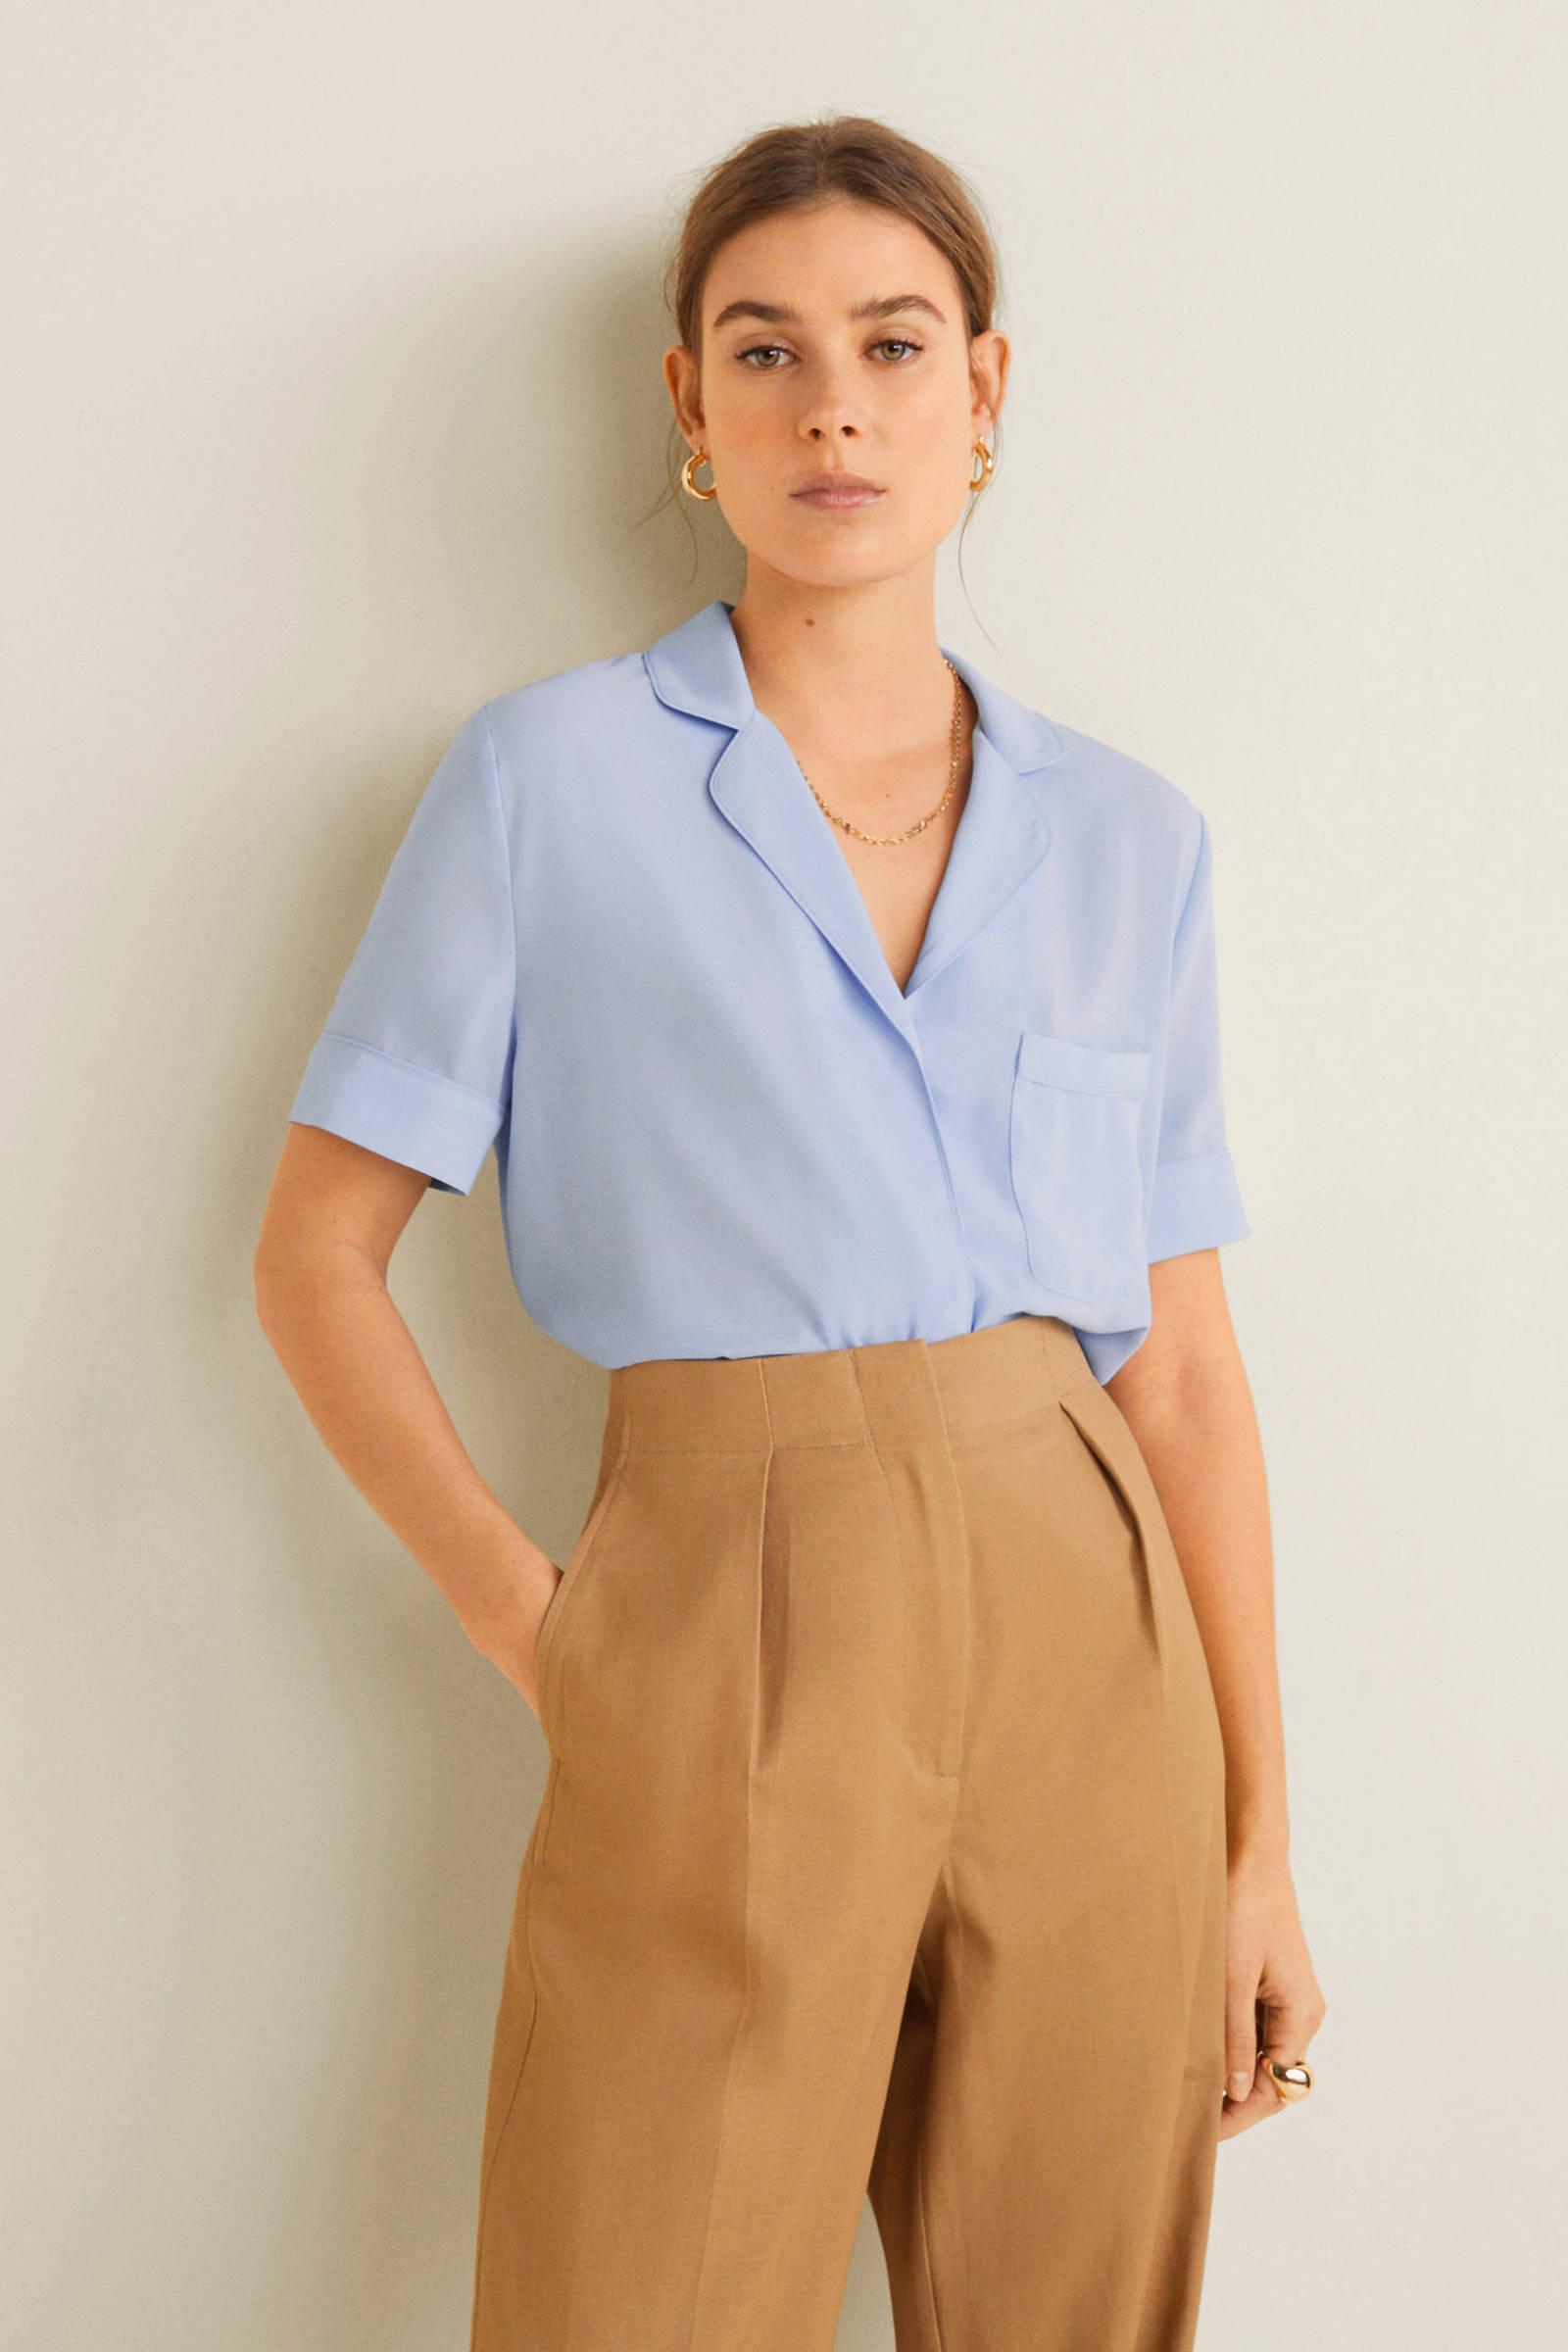 Mango lichtblauw Mango Mango blouse lichtblauw Mango blouse lichtblauw blouse blouse WZwwYURAq